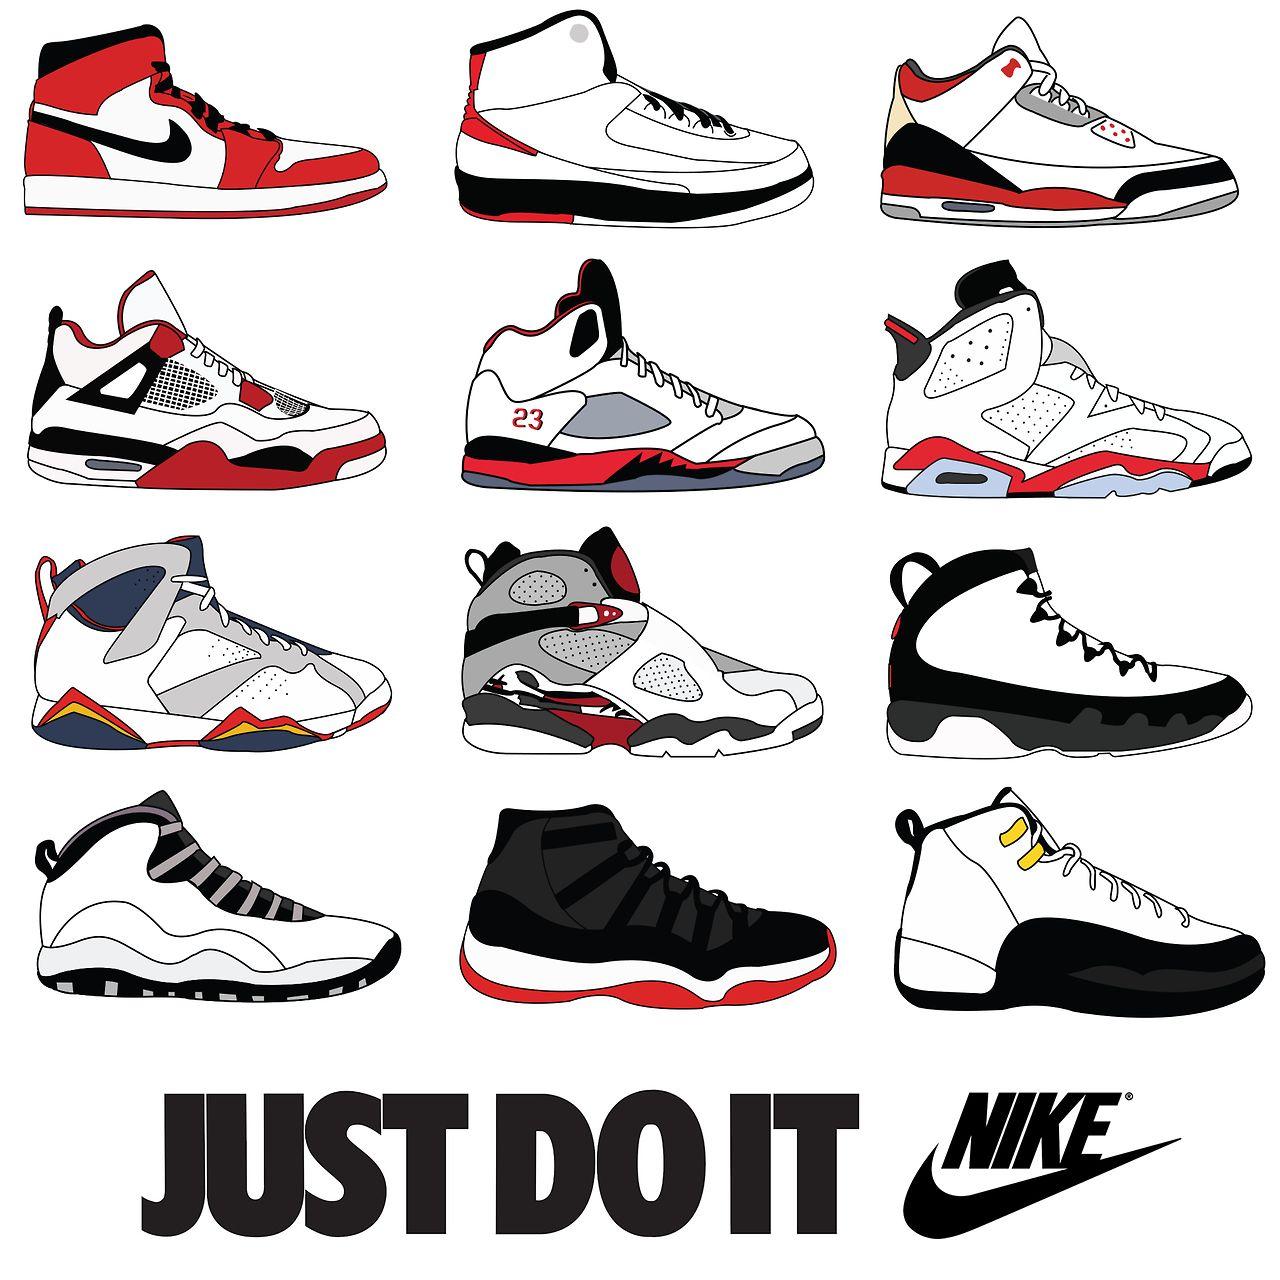 best service c7cf4 674b9 Overview Scarpe Nike Gratis, Nike Da Donna, Scarpe Nike Outlet, Nike Shox,